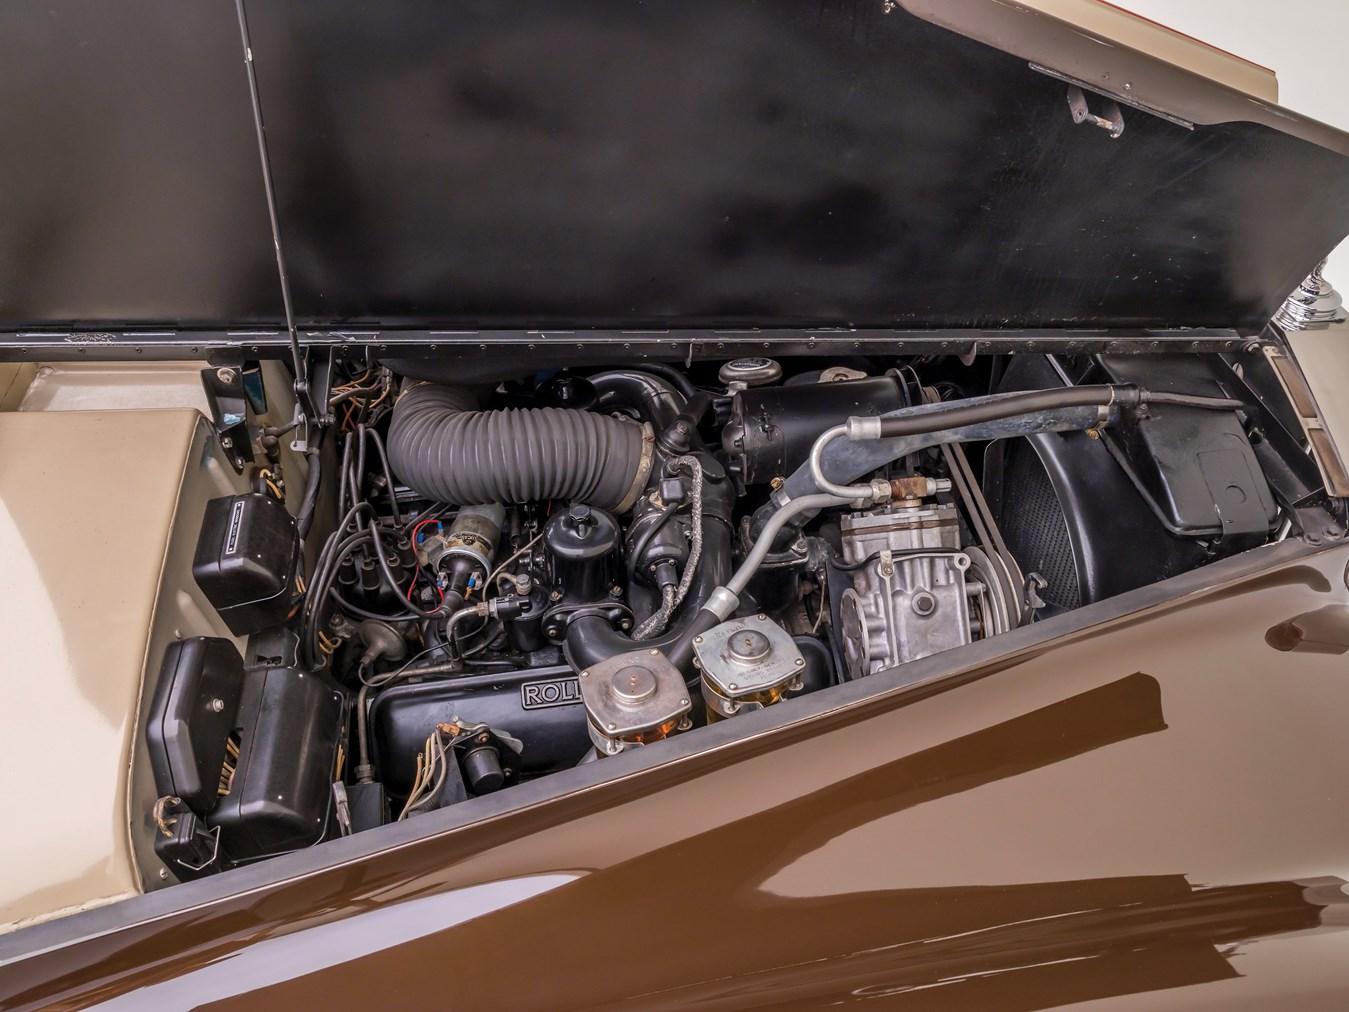 1966 Rolls-Royce Silver Cloud III Touring Limousine engine